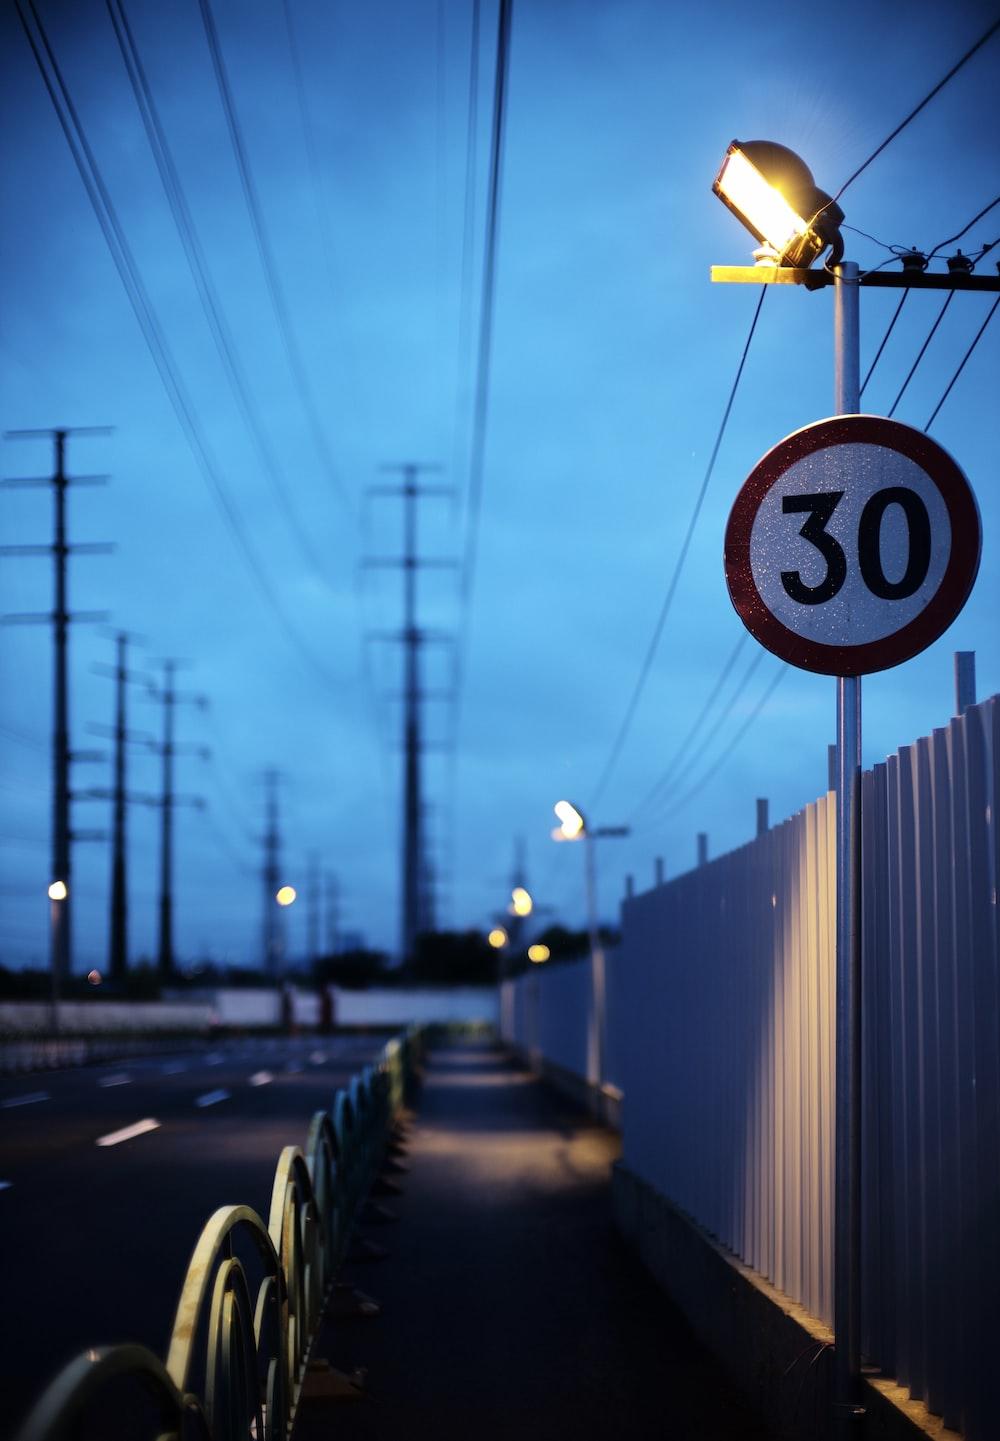 30 traffic signage